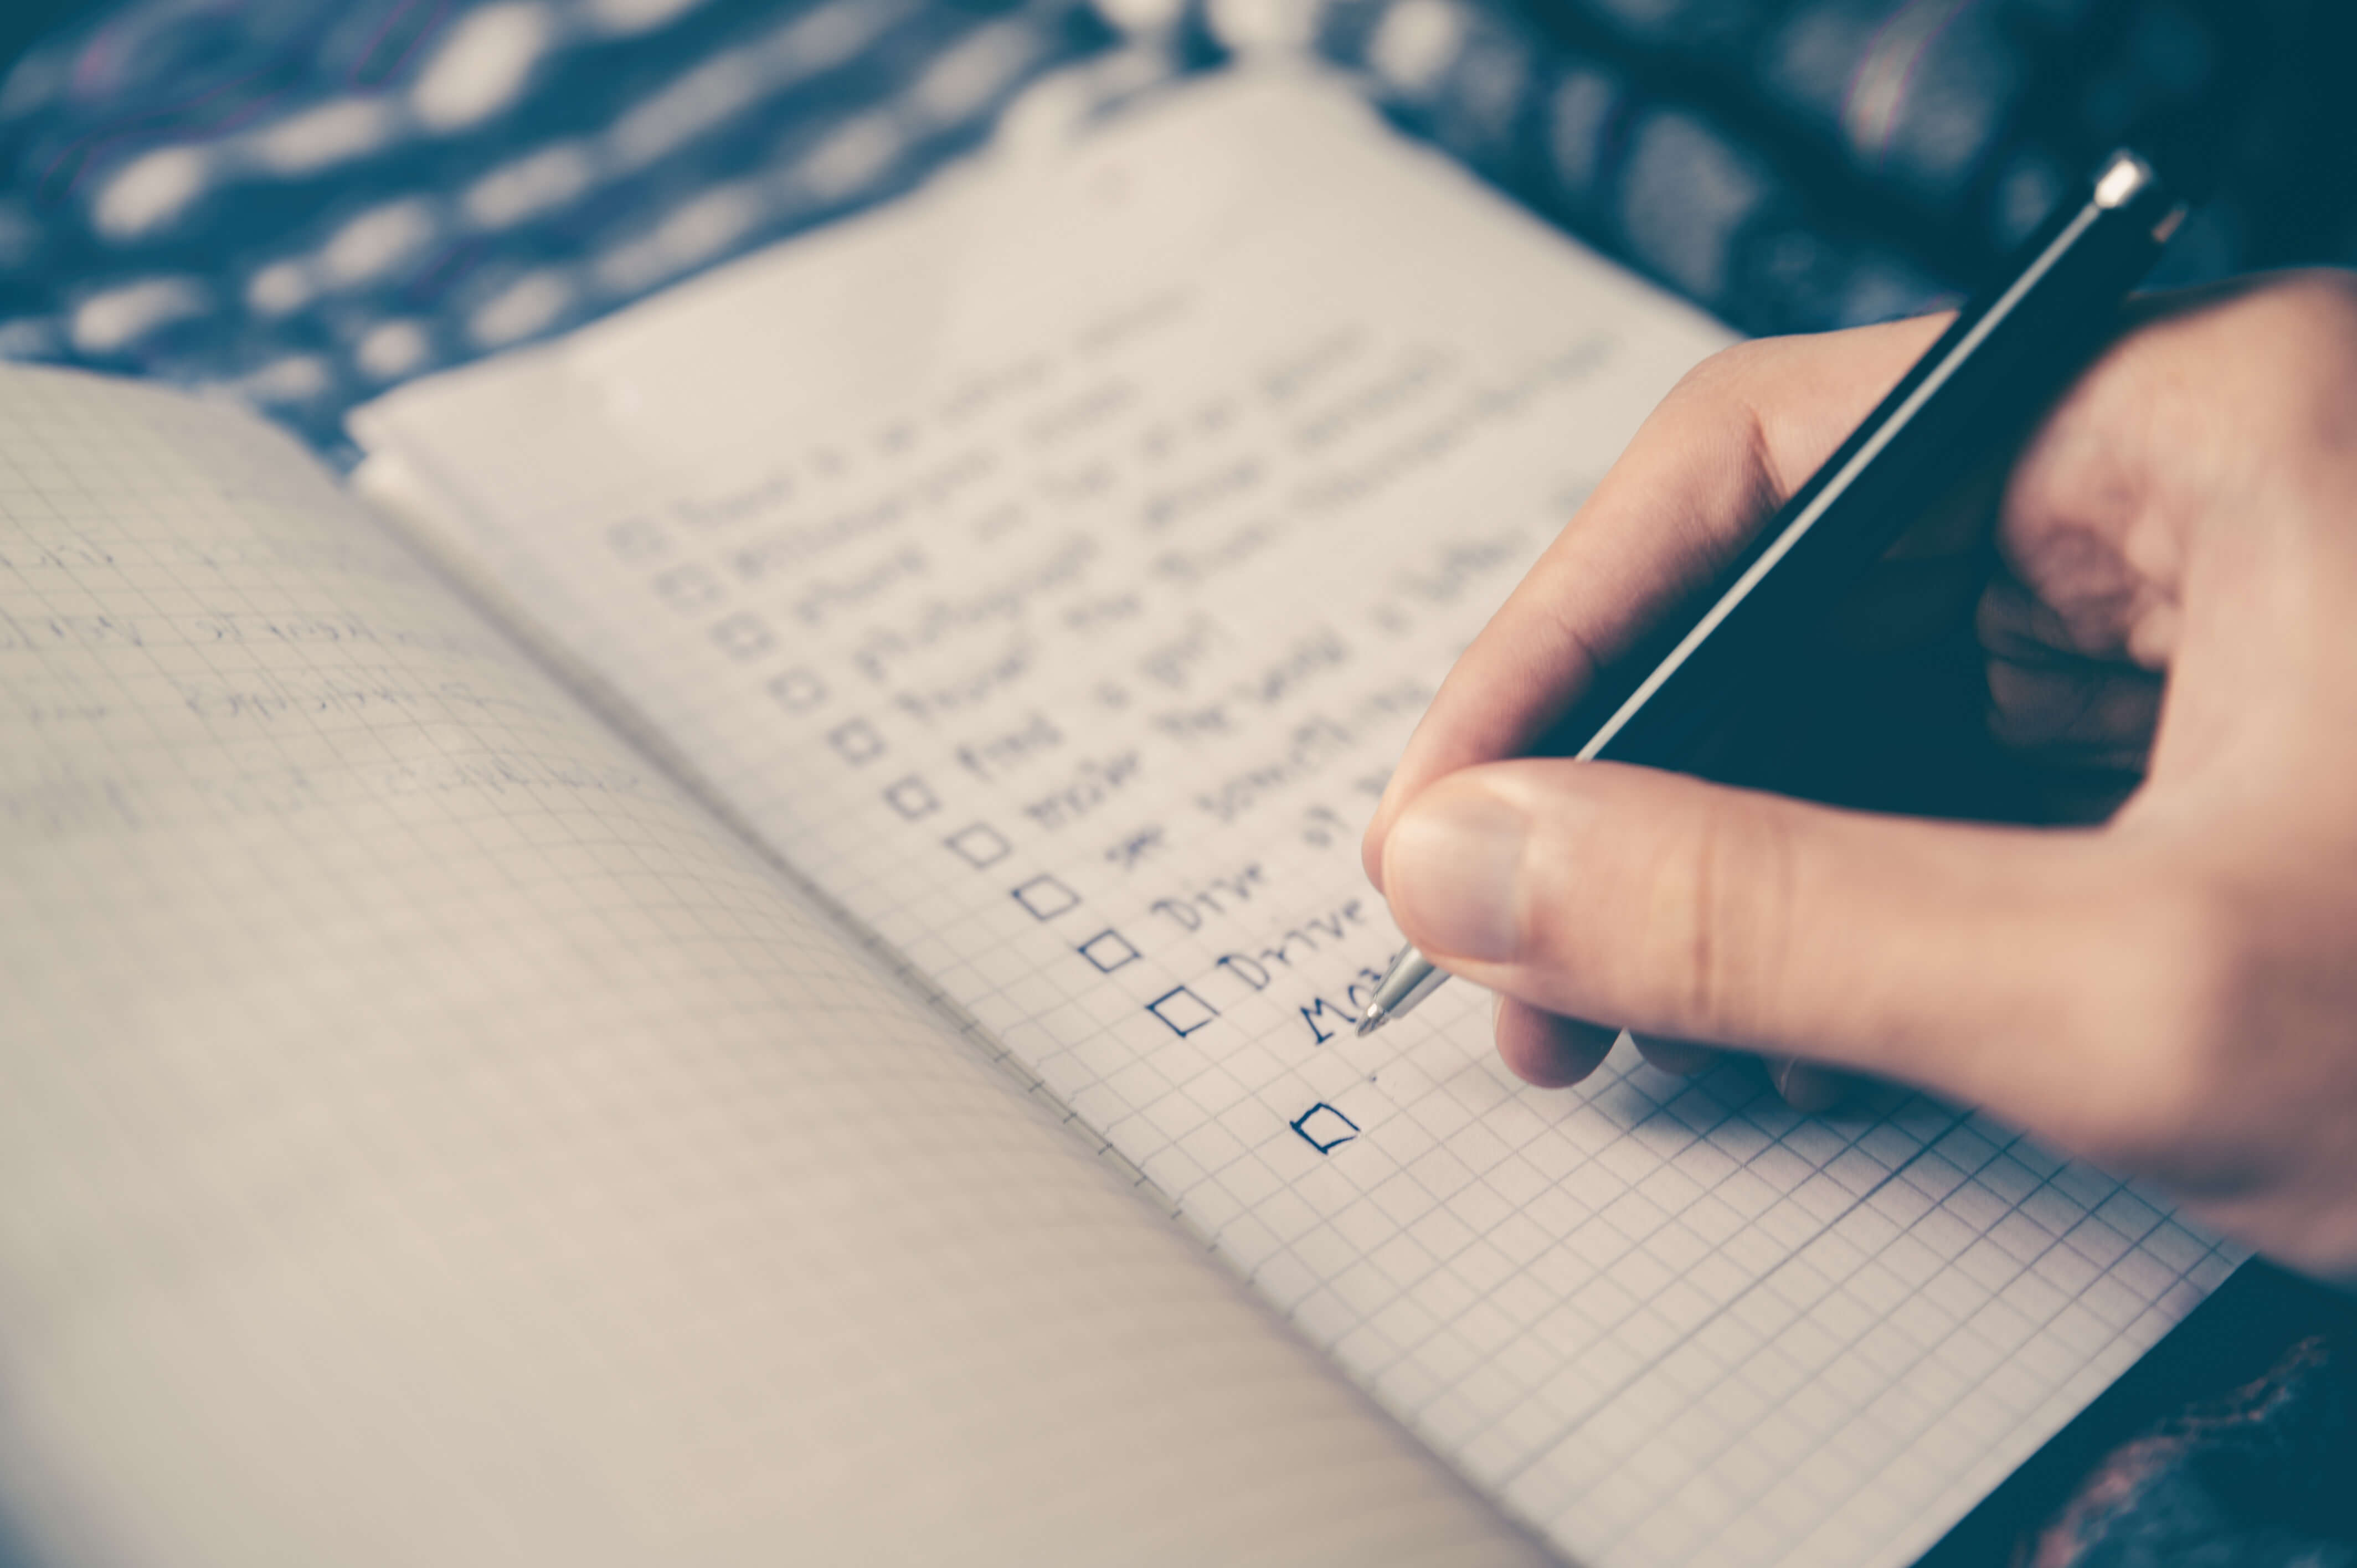 holiday marketing checklist - establish your marketing foundation